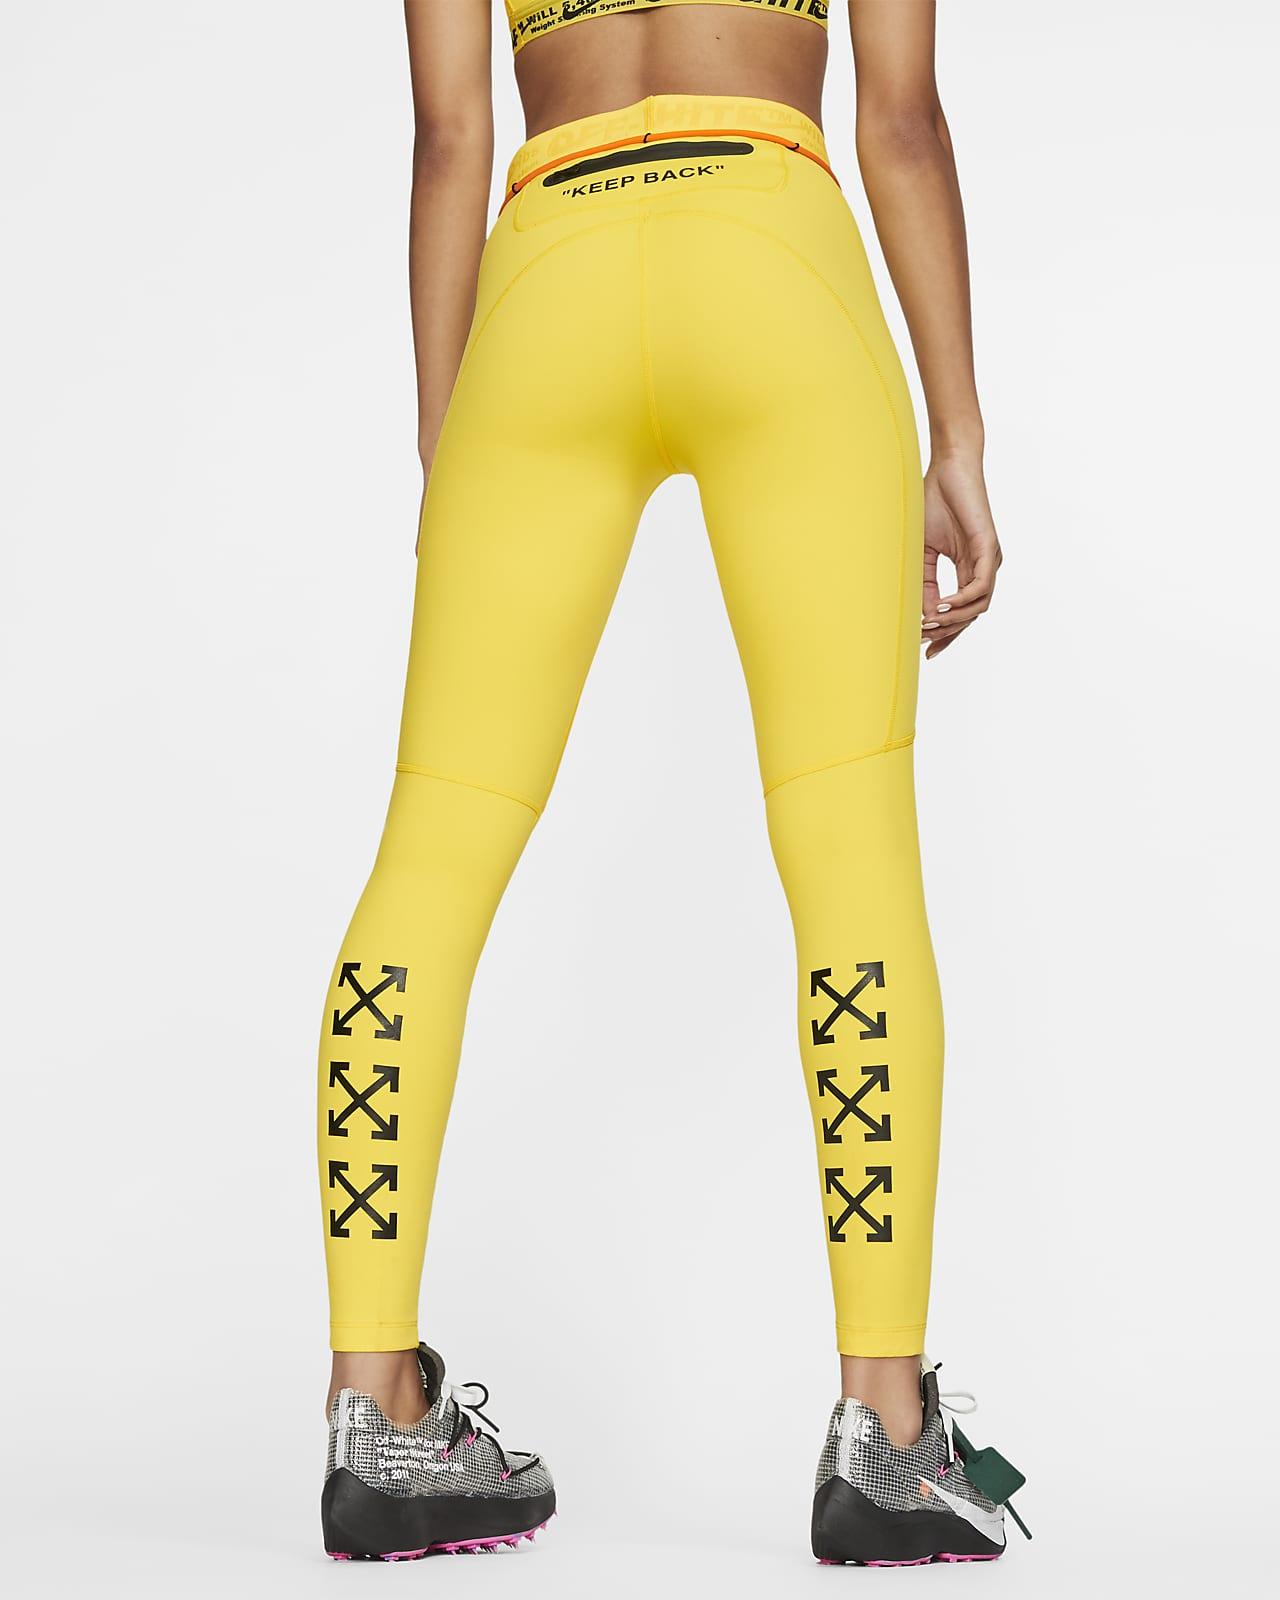 Women's Running Tights. Nike JP